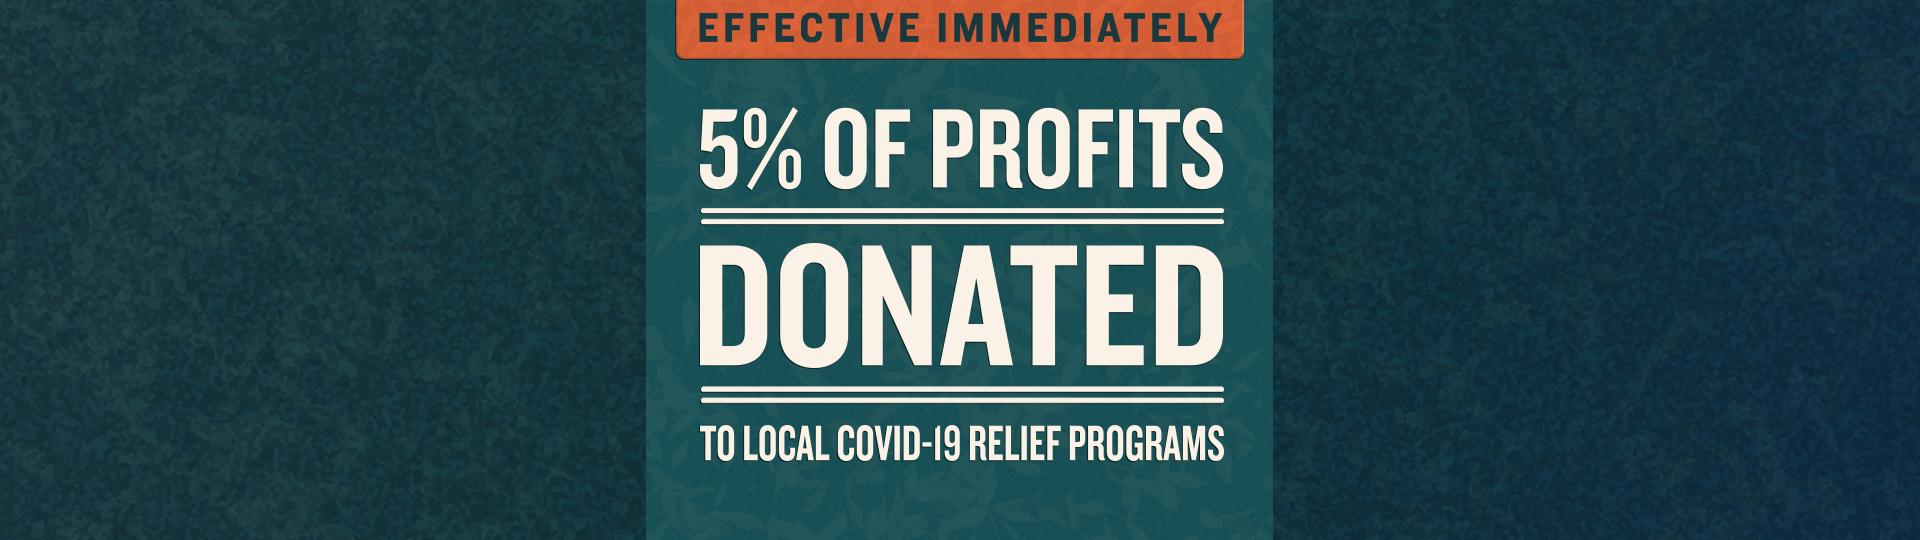 Covid donations